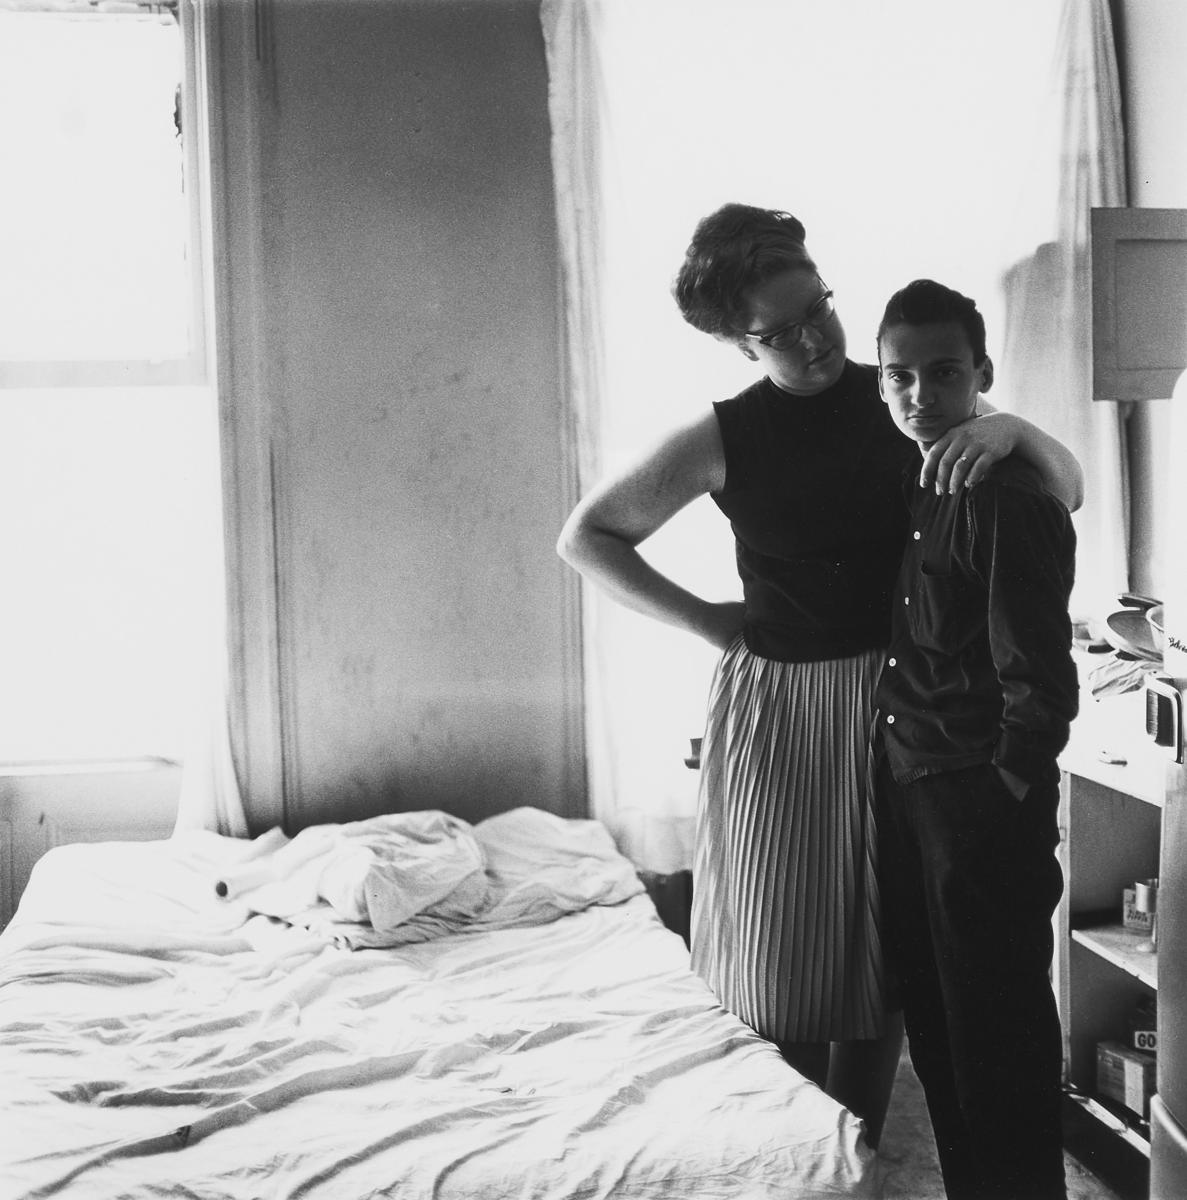 Birnnale Donna, una foto in bianco e nero di Diane Arbus, due donne in una stanza